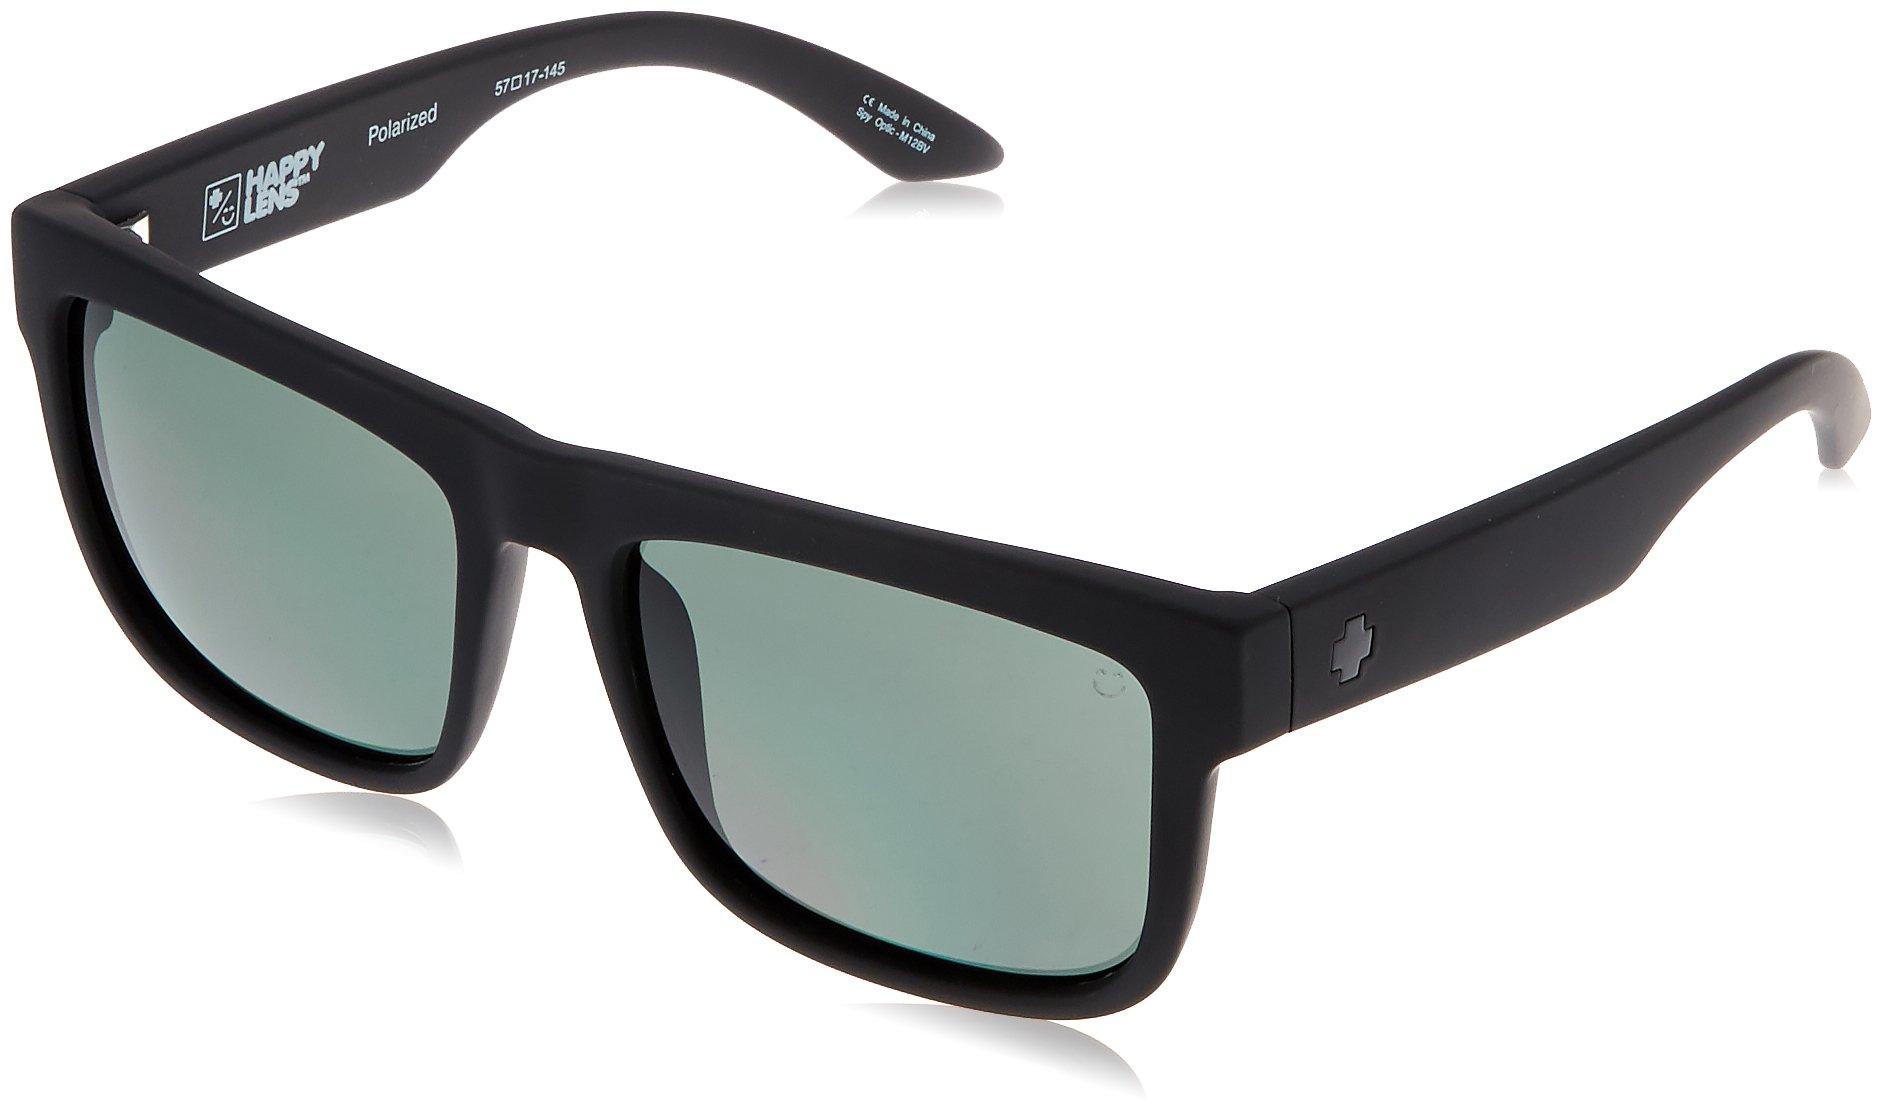 Spy Optic Discord Polarized Flat Sunglasses, Soft Matte Black/Happy Gray/Green Polar, 57 mm